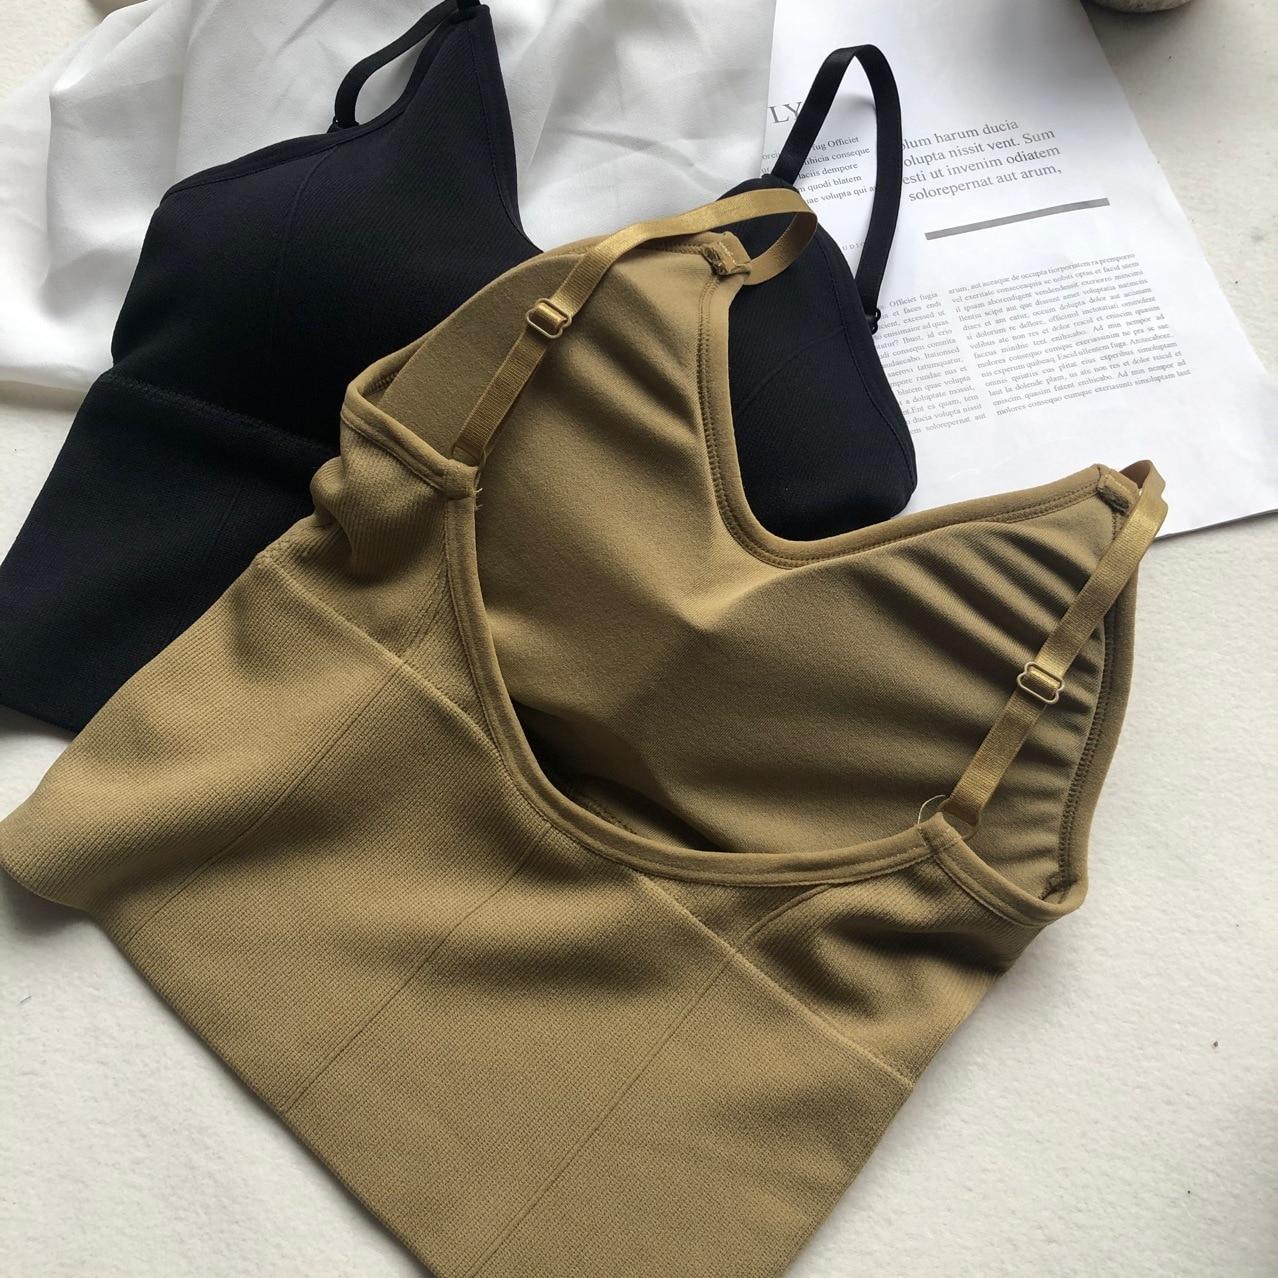 Mulher beleza voltar topos tubo superior feminino streetwear sem mangas camis sem costura lingerie esportiva t sutiã topo de colheita bandeau tanque superior